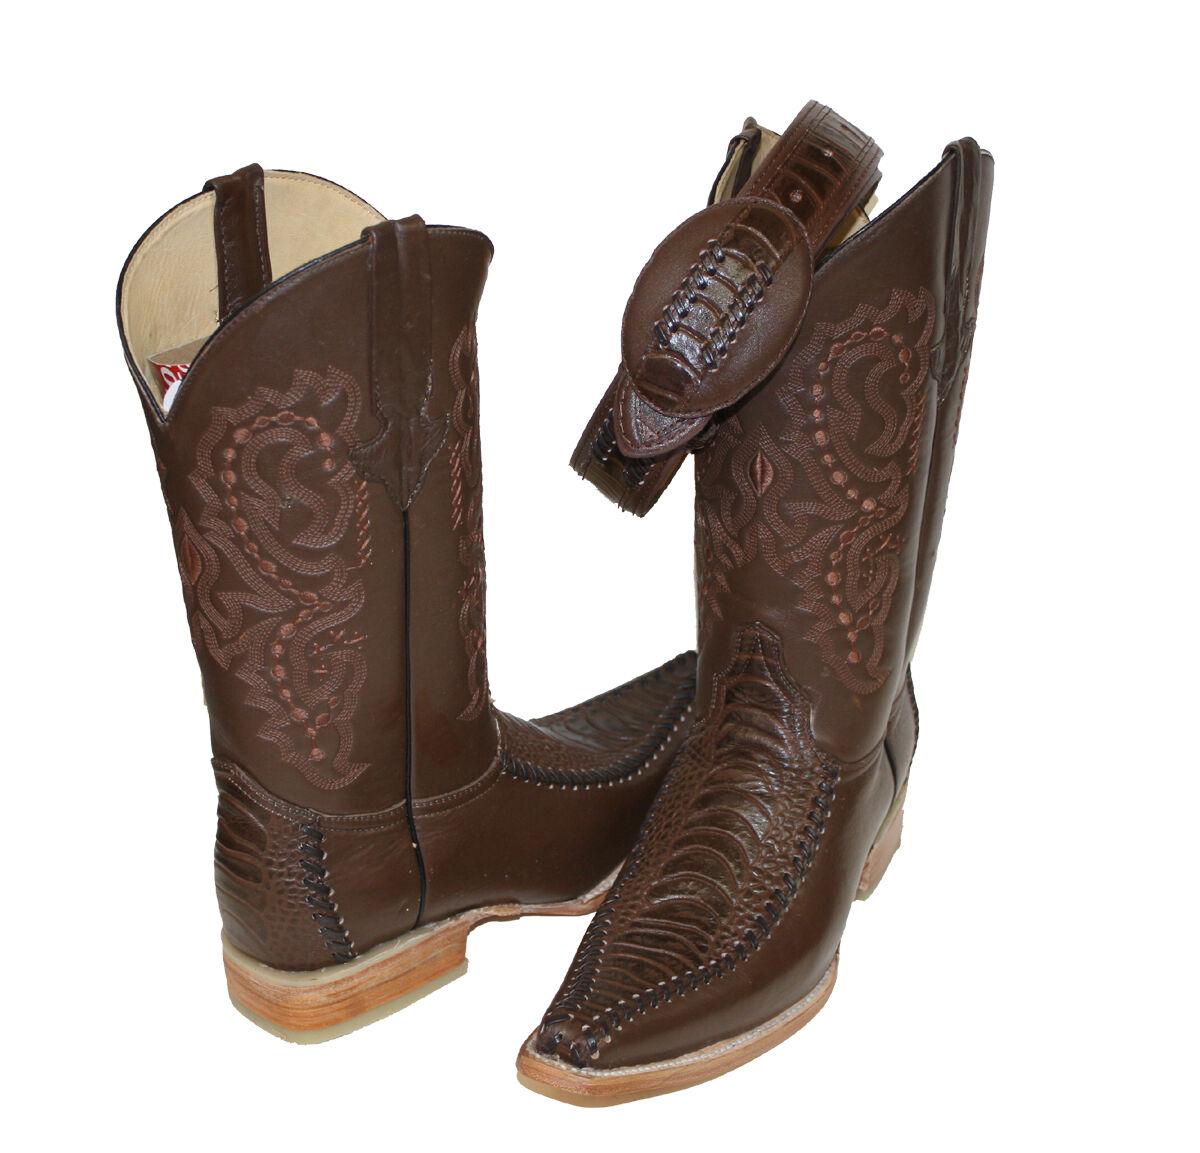 Men's Leather Crocodile Embossed Leather Cowboy Handmade Boot FREE BELT 109.99